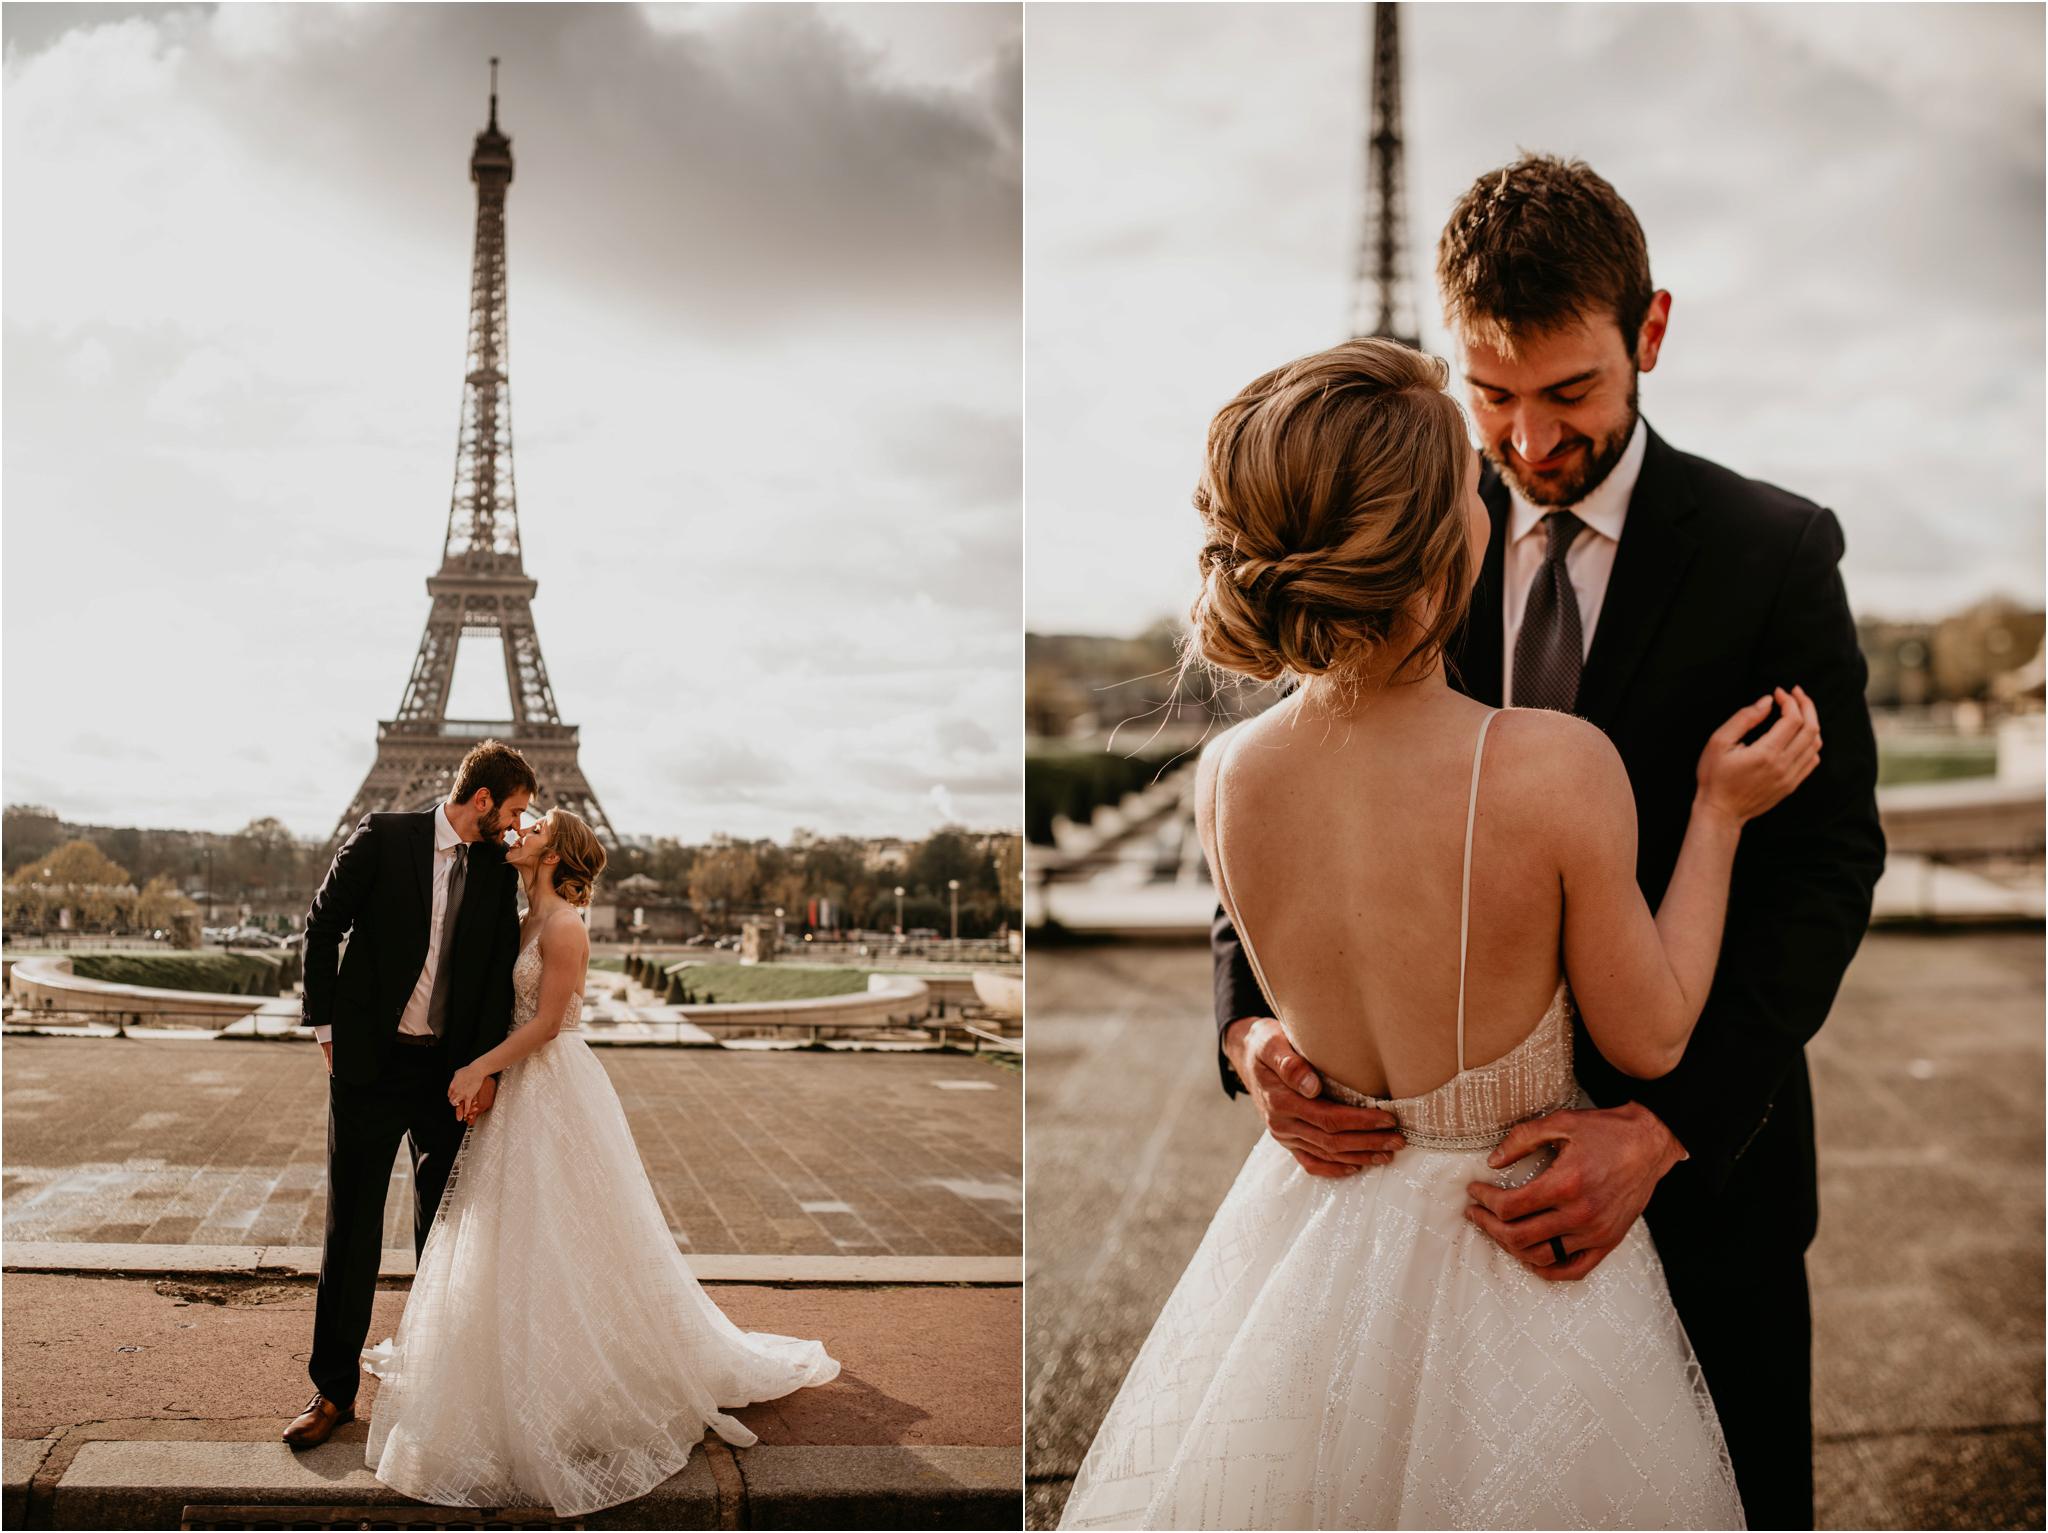 miranda-and-jared-paris-elopement-destination-wedding-photographer-065.jpg